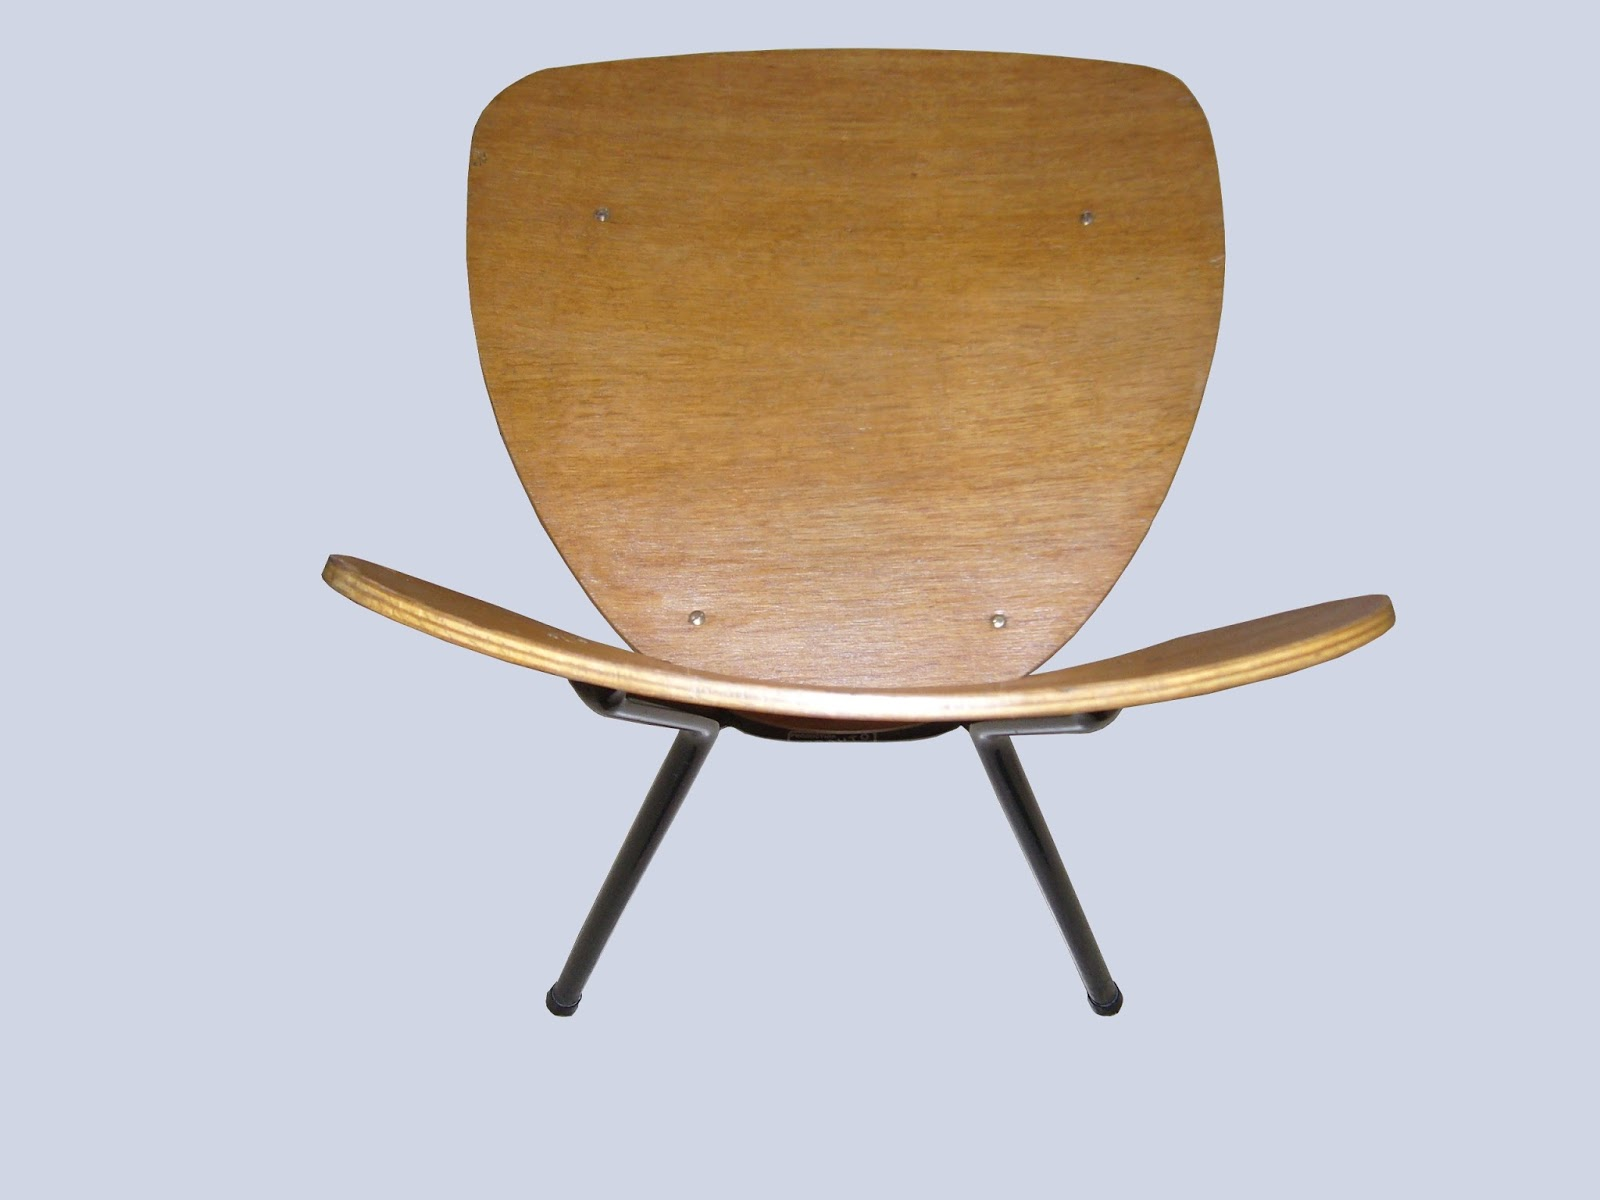 jacques hitier chaise libellule tubauto 1955 la. Black Bedroom Furniture Sets. Home Design Ideas